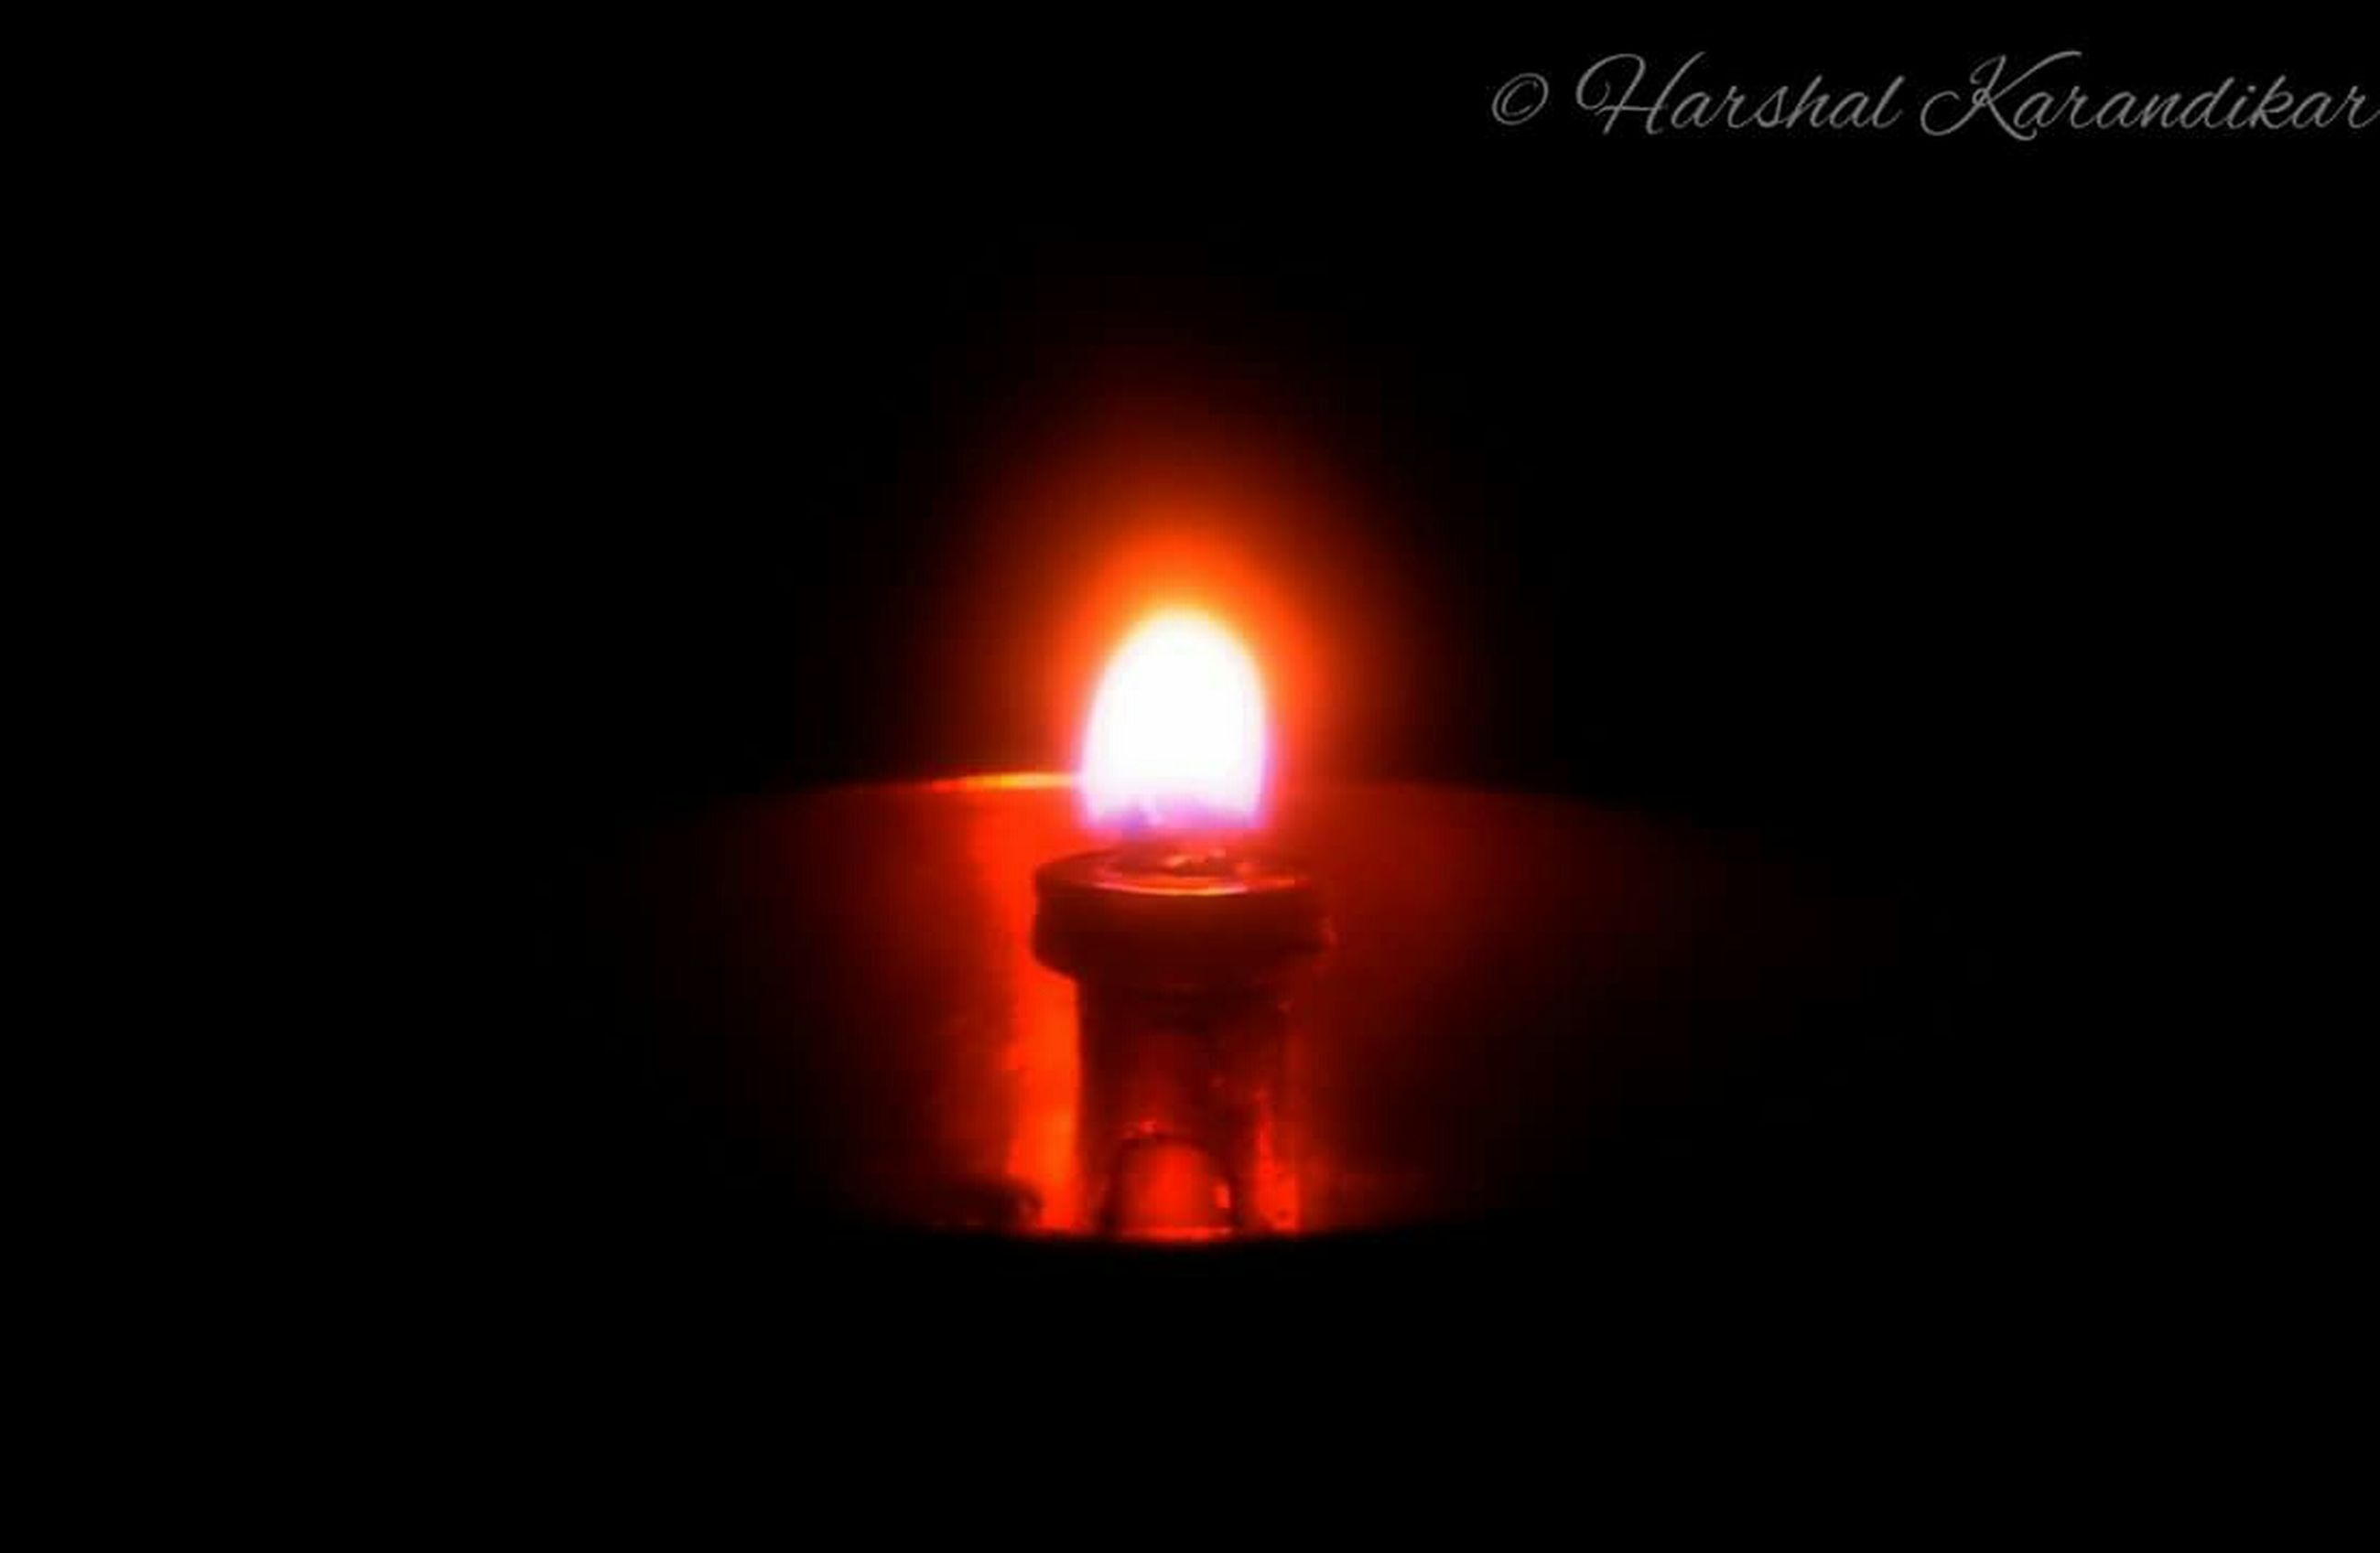 flame, burning, illuminated, glowing, heat - temperature, fire - natural phenomenon, candle, lit, dark, indoors, darkroom, copy space, close-up, night, studio shot, candlelight, black background, fire, lighting equipment, light - natural phenomenon